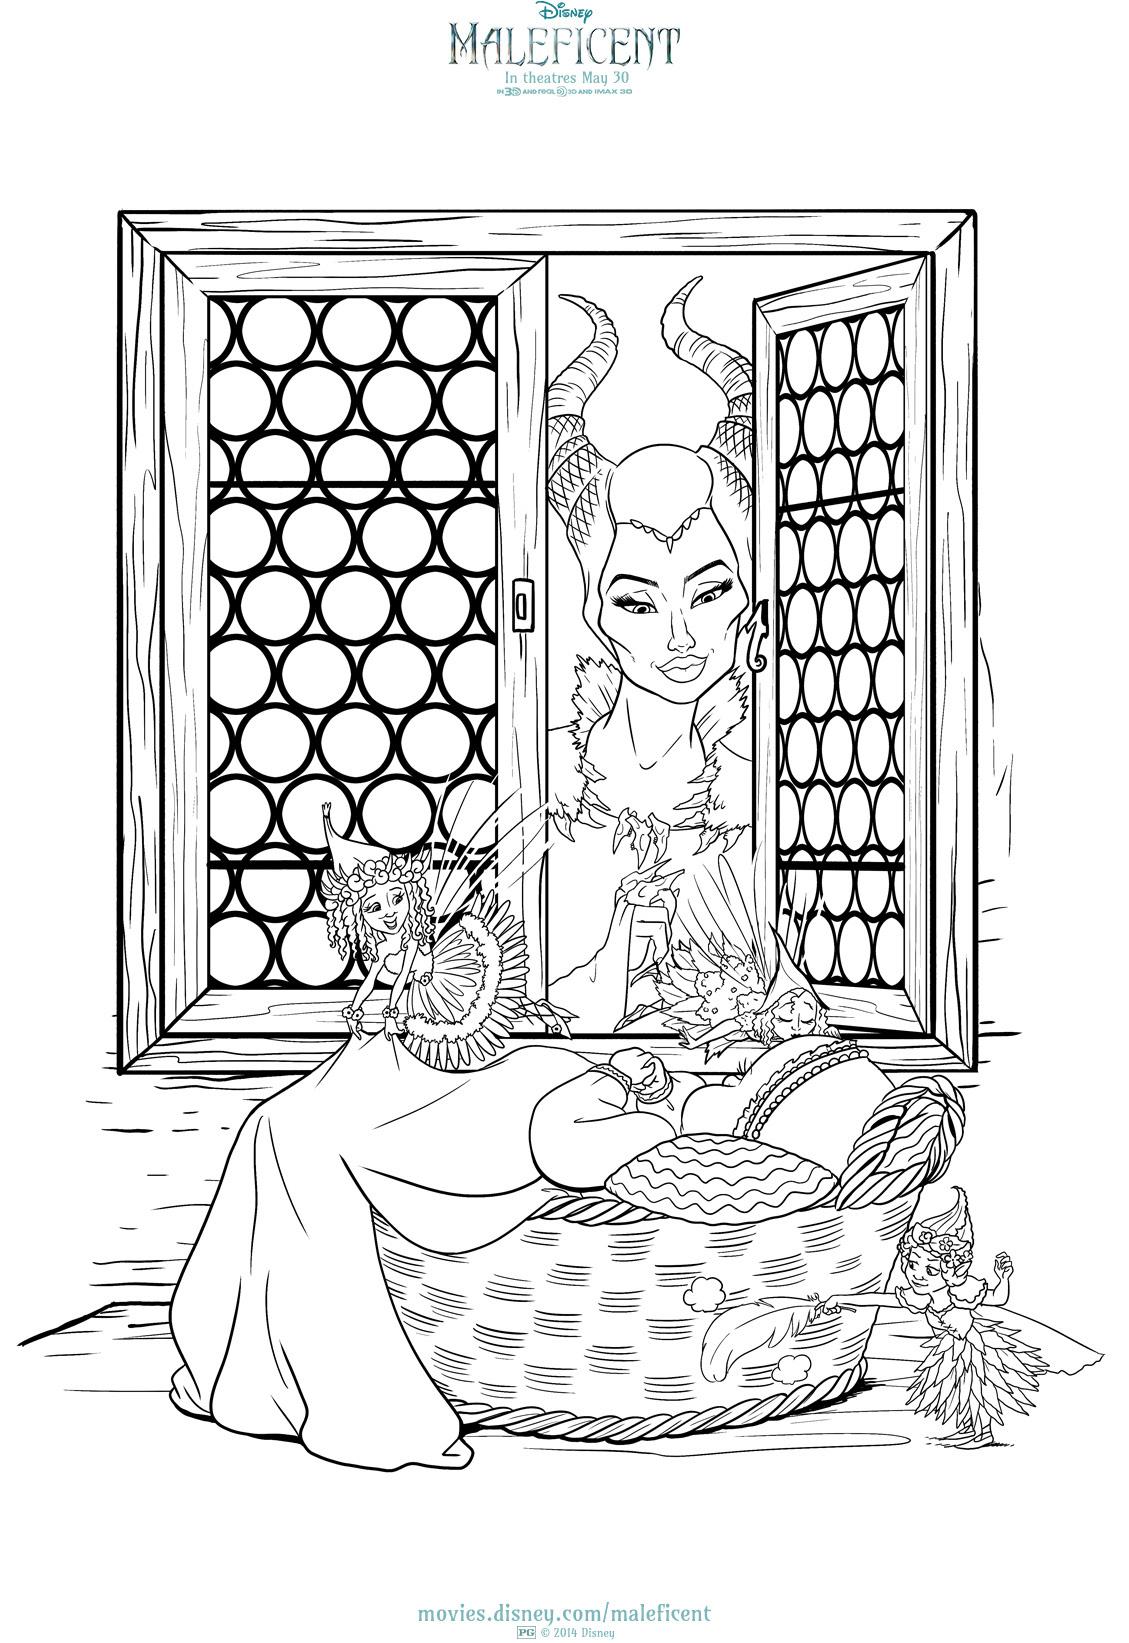 Image - Maleficent Colour ins 3.jpg | Disney Wiki | FANDOM powered ...